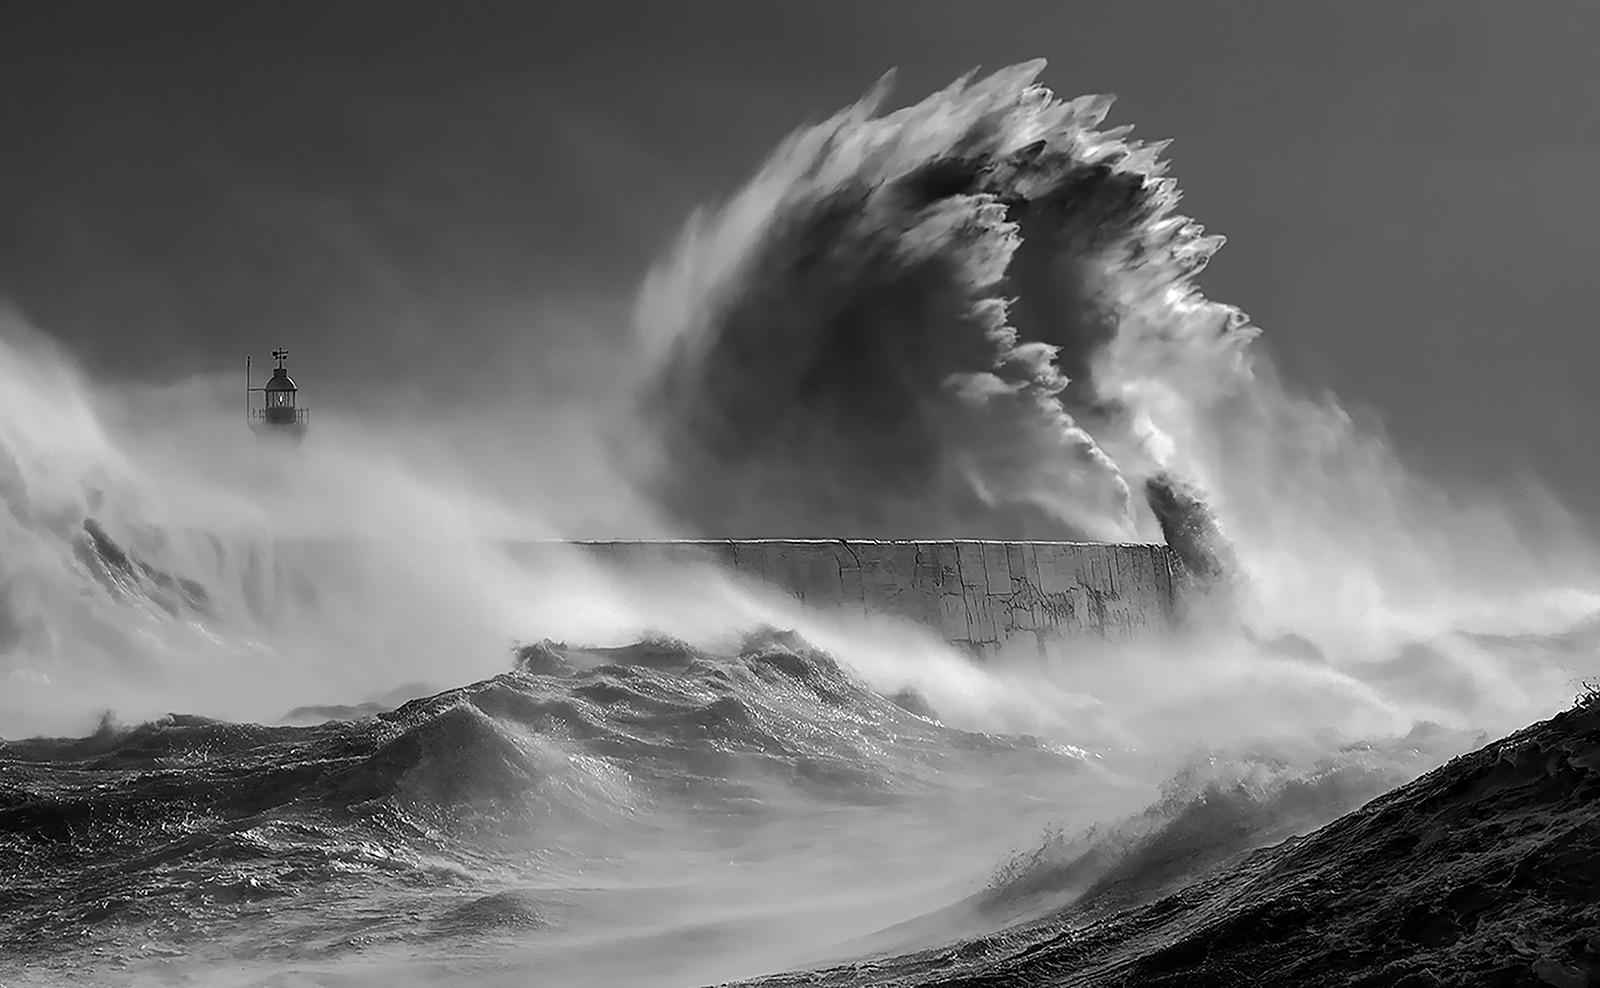 Ray-Acland-Storm-Brian-10